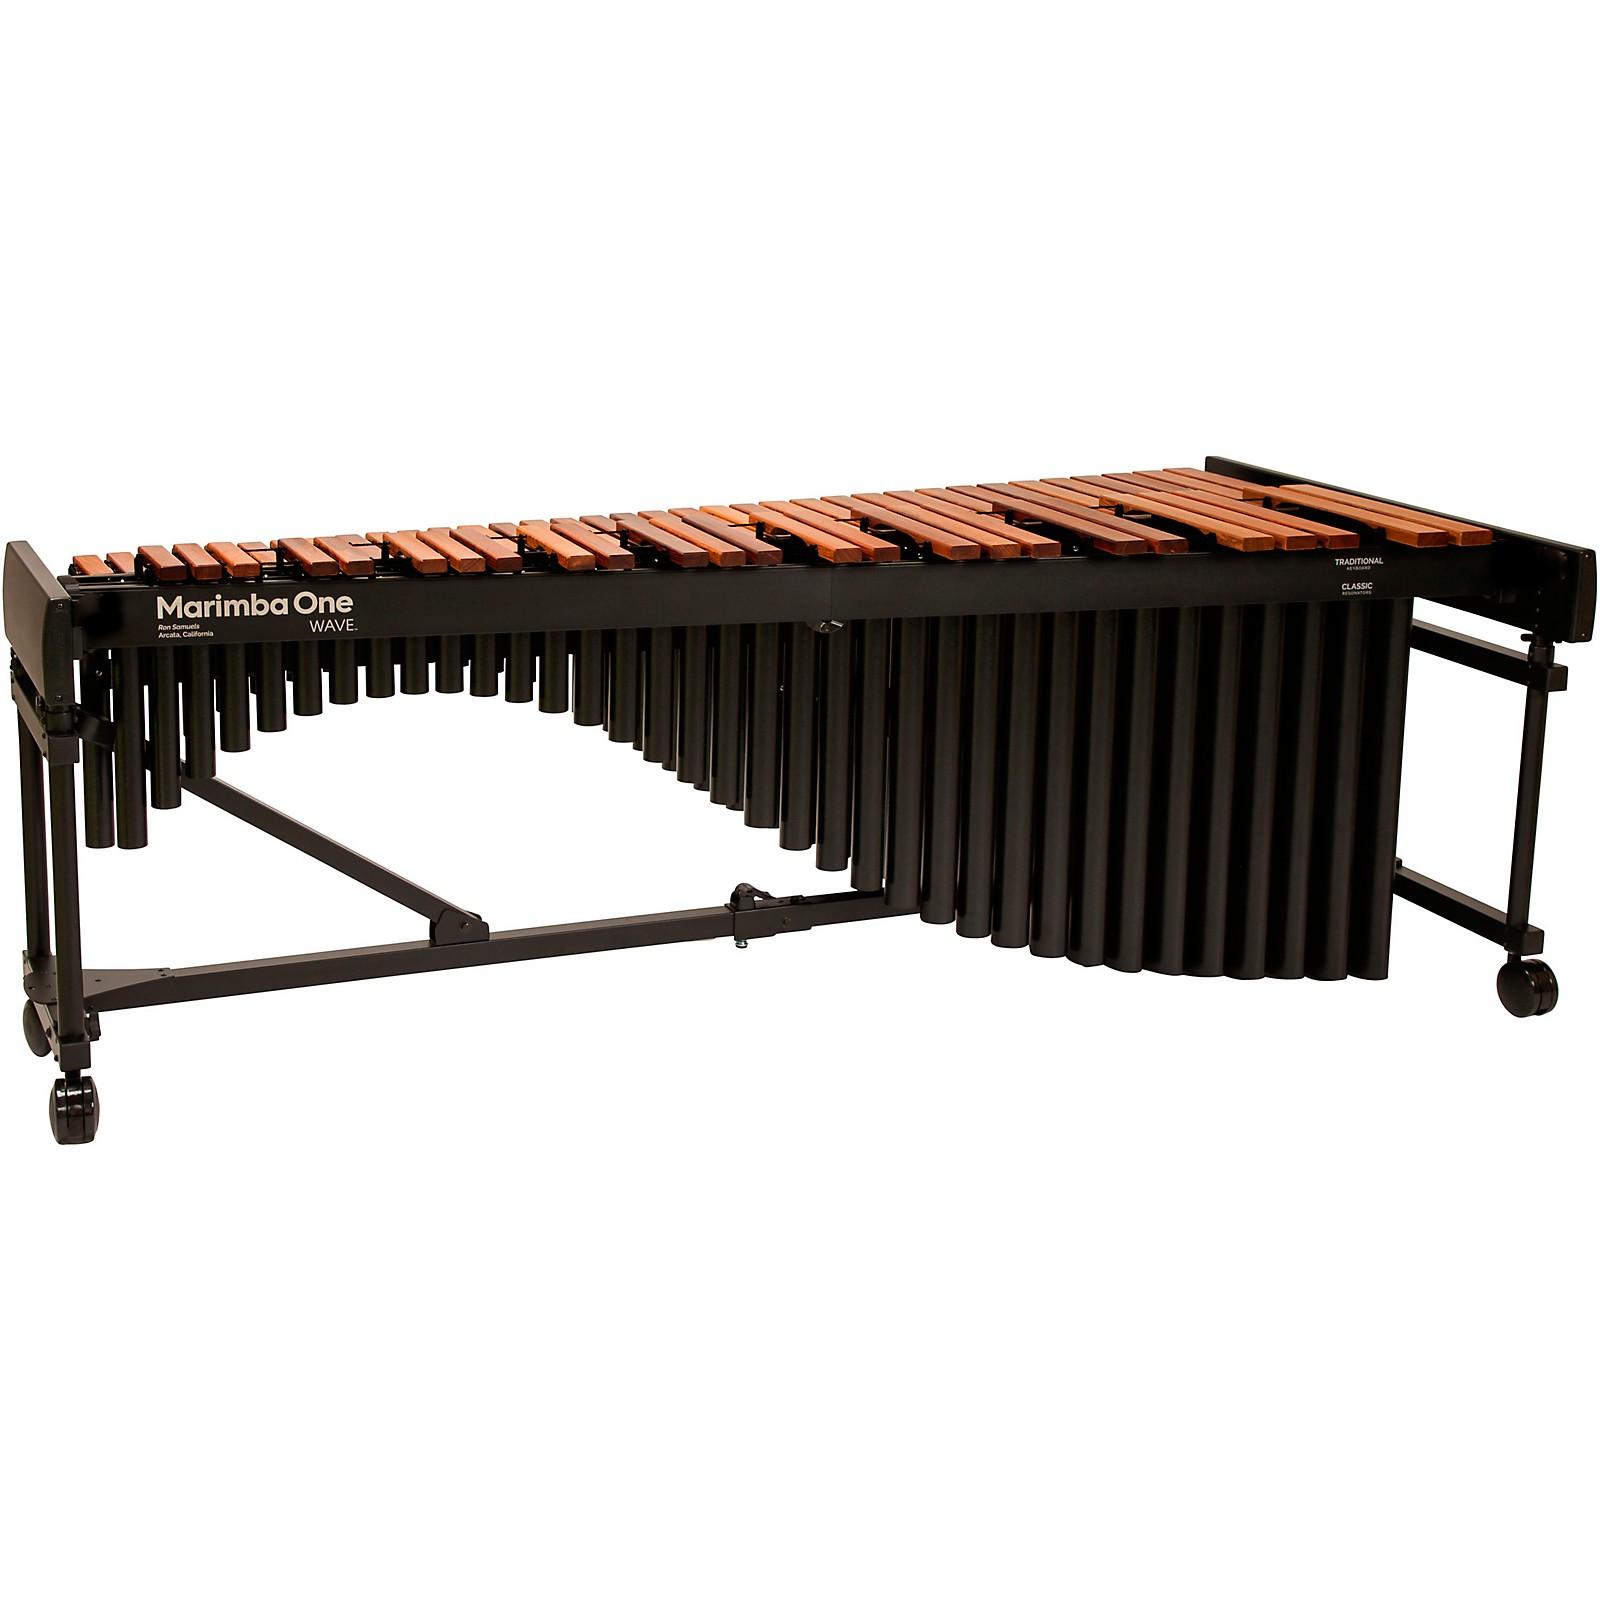 Marimba One Wave #9604 A442 5.0 Octave Marimba with Traditional Keyboard and Basso Bravo Resonators 4